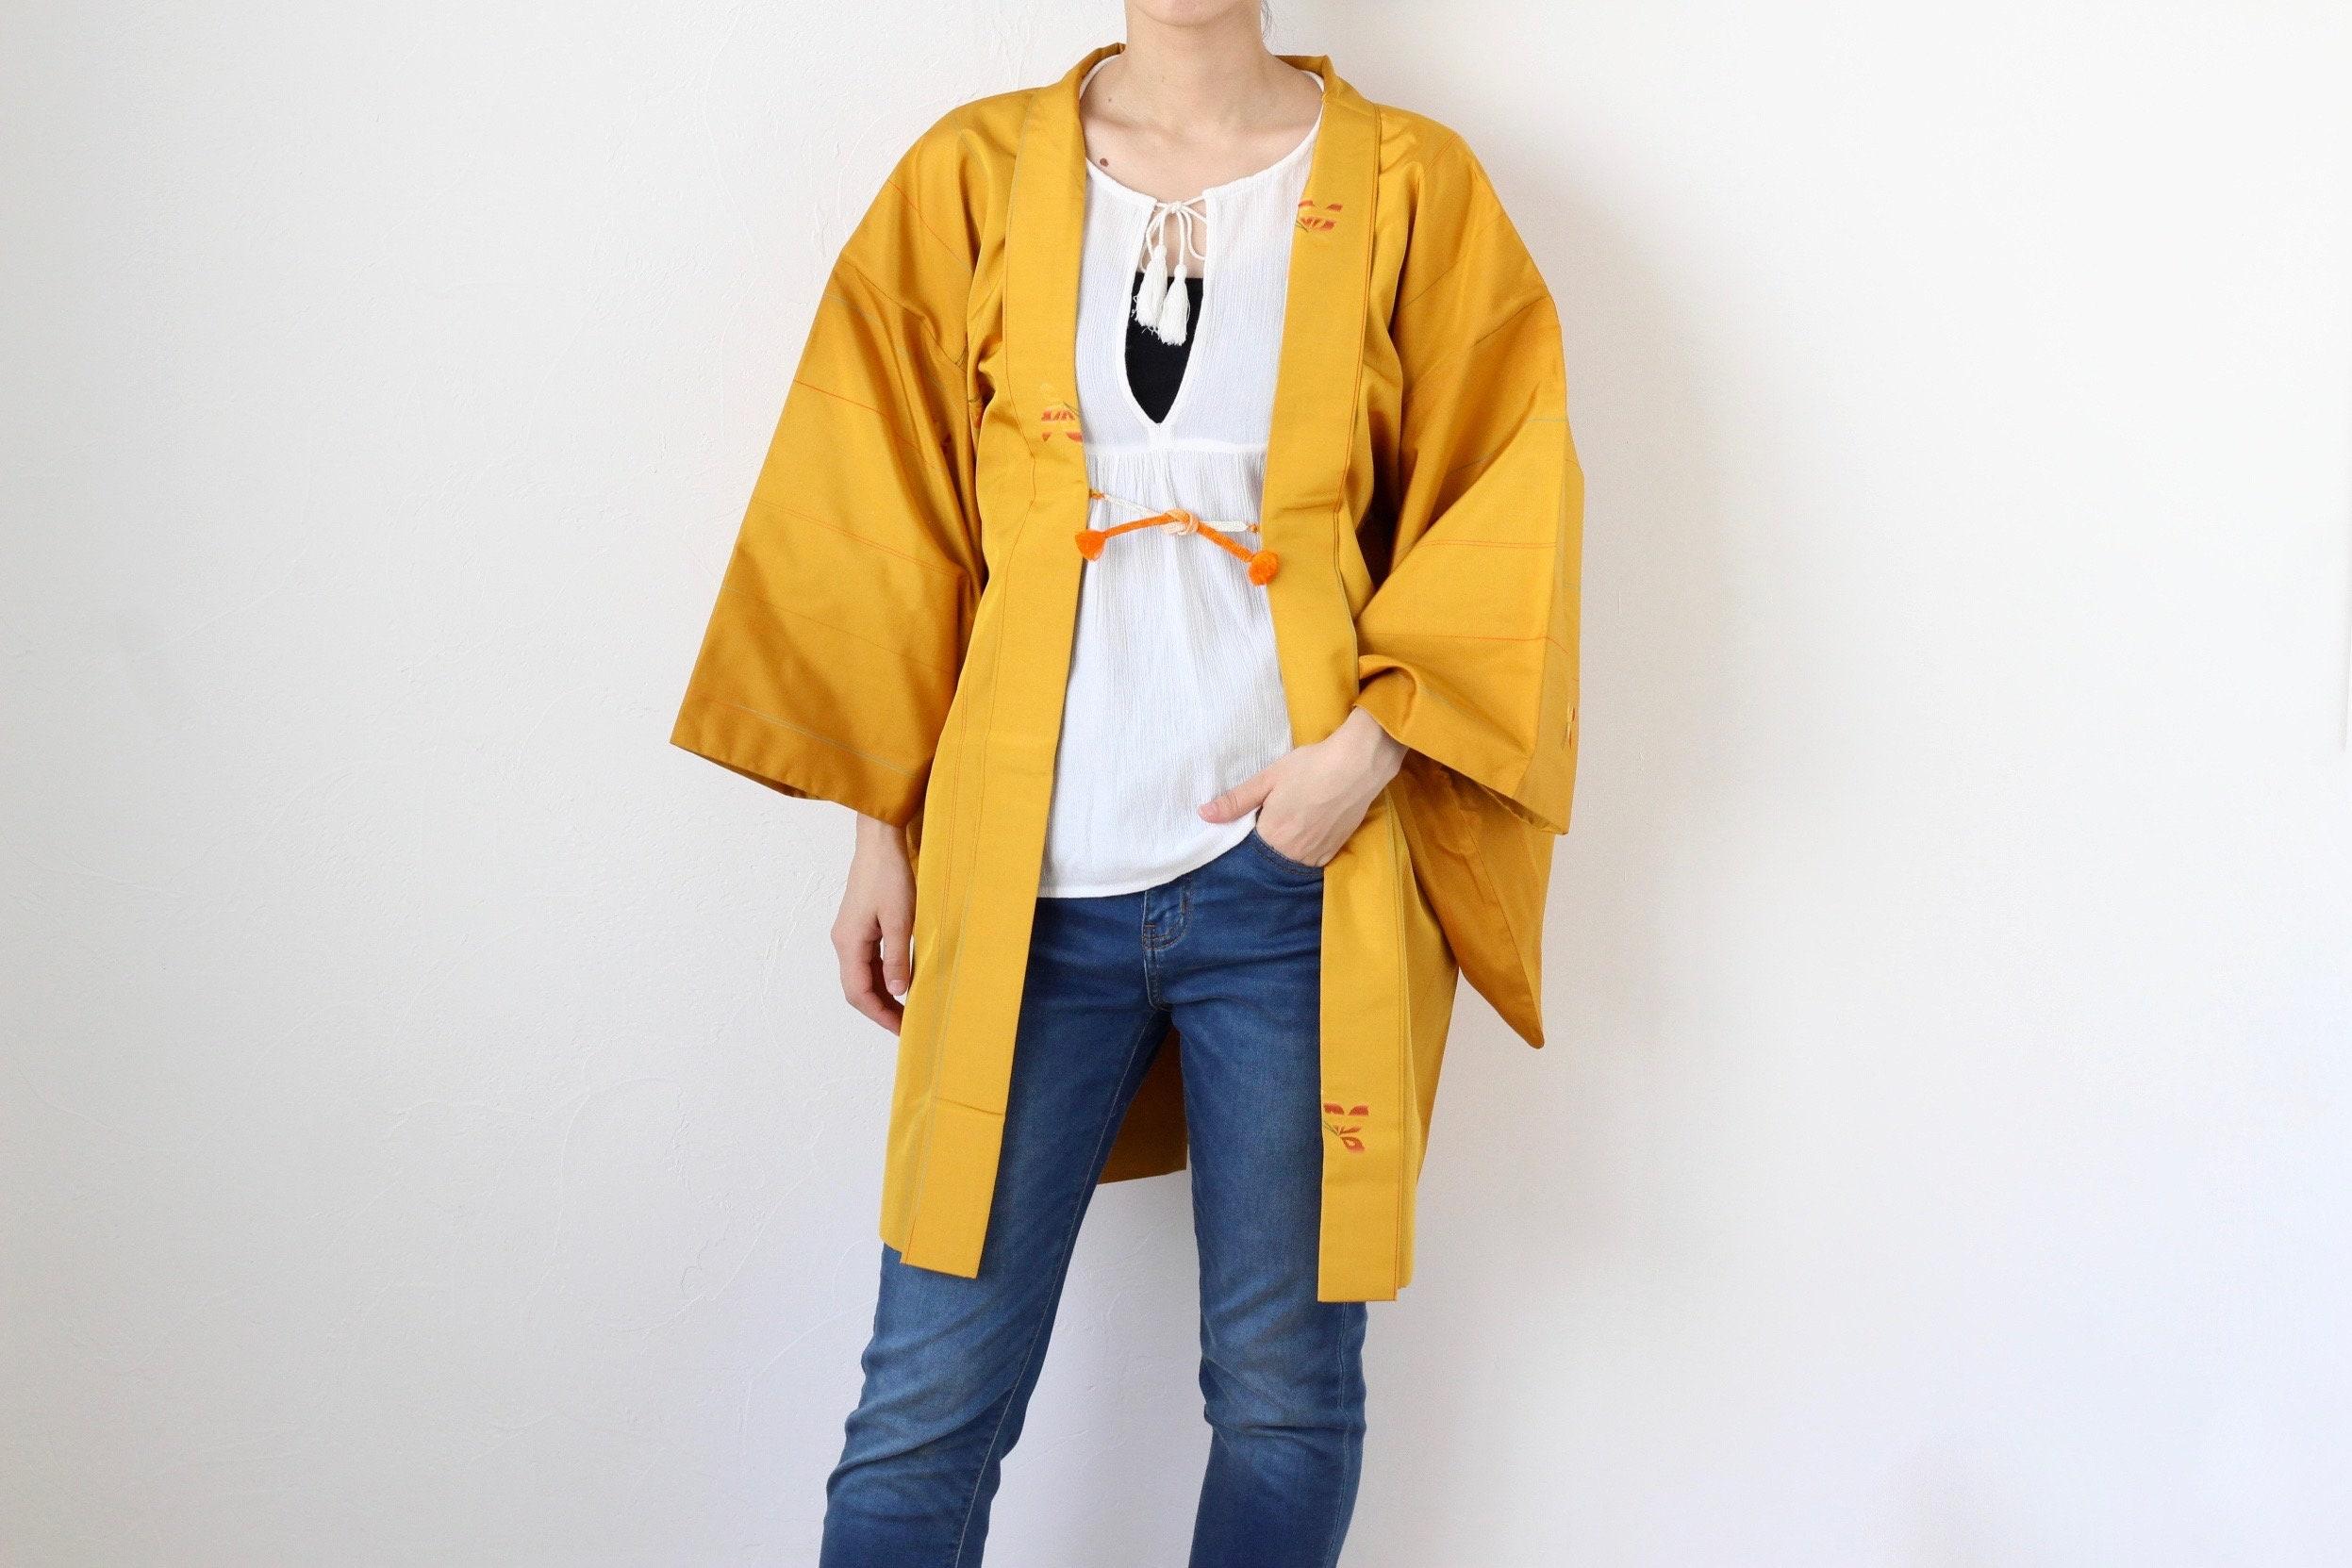 b75b3633d12 butterfly kimono EXCELLENT VINTAGE kimono jacket Japanese